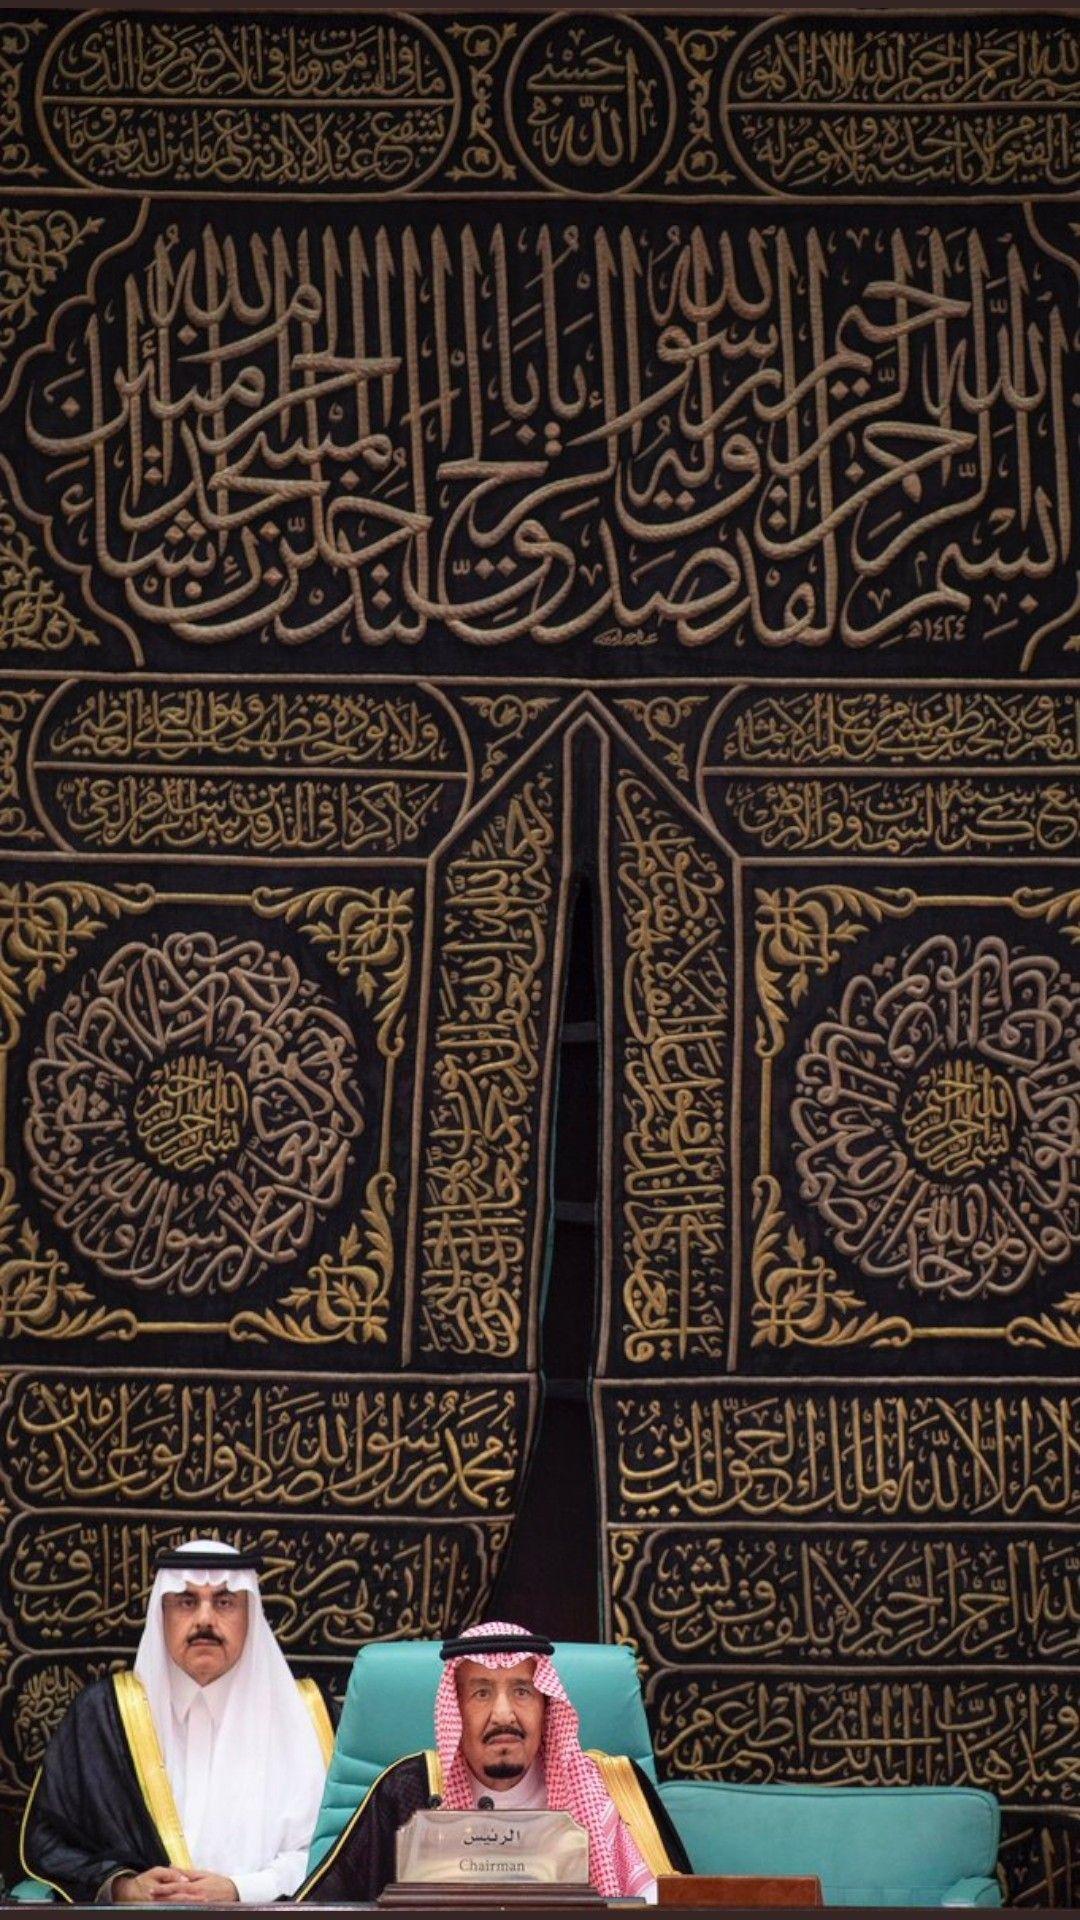 King Salman Kingdom Of Saudi Arabia الملك سلمان بن عبدالعزيز King Salman Saudi Arabia Saudi Arabia Prince Saudi Arabia